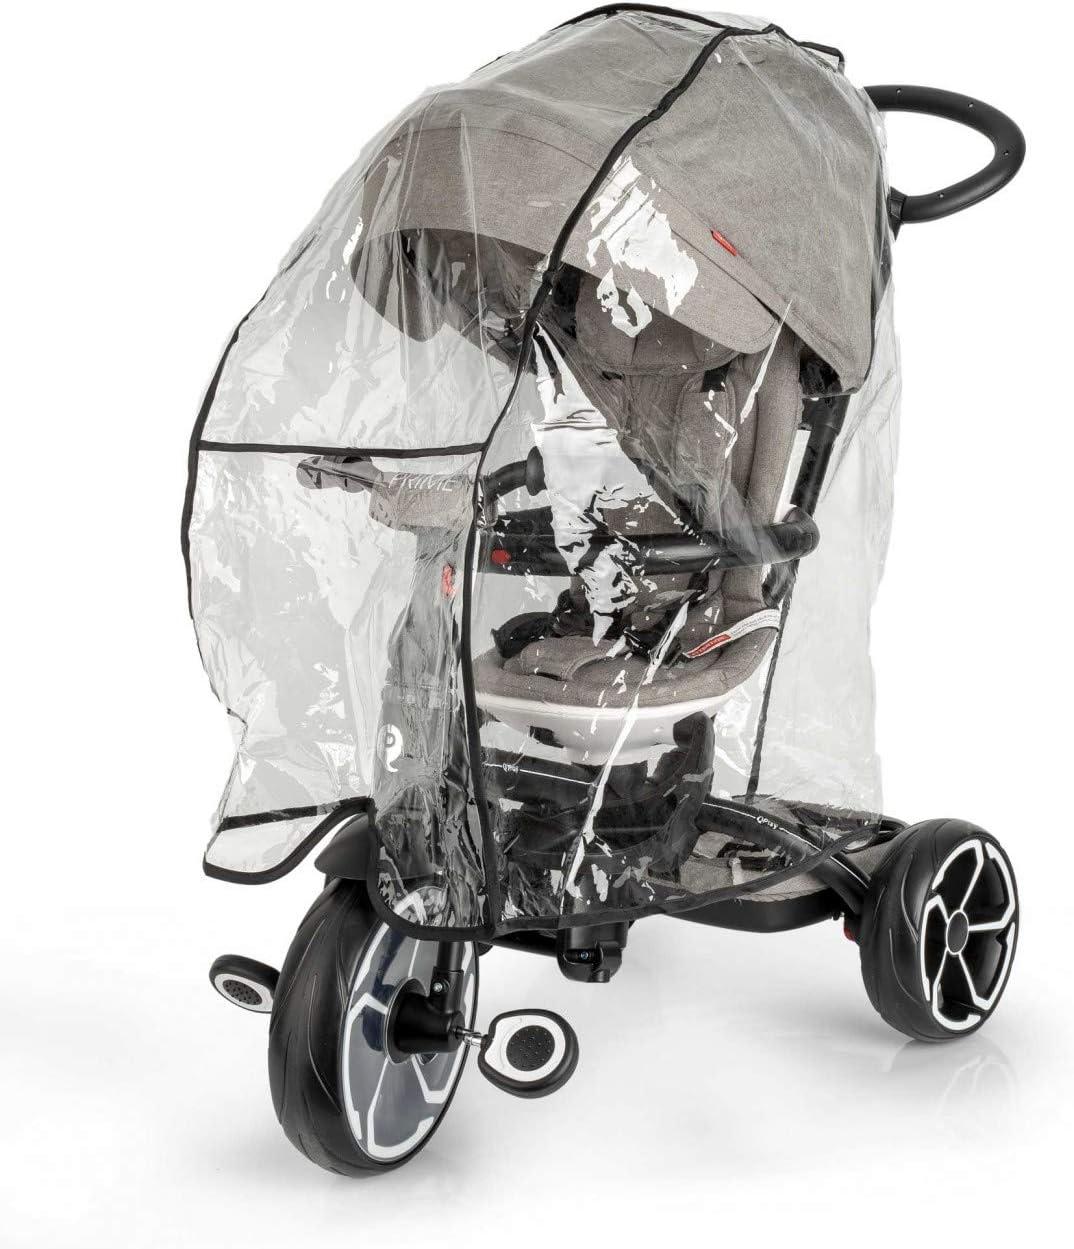 Protector de lluvia para triciclos QPlay - Burbuja Lluvia - Raincover - Impermeable - Cortaviento - Con ventilación - Compatible con triciclos QPlay